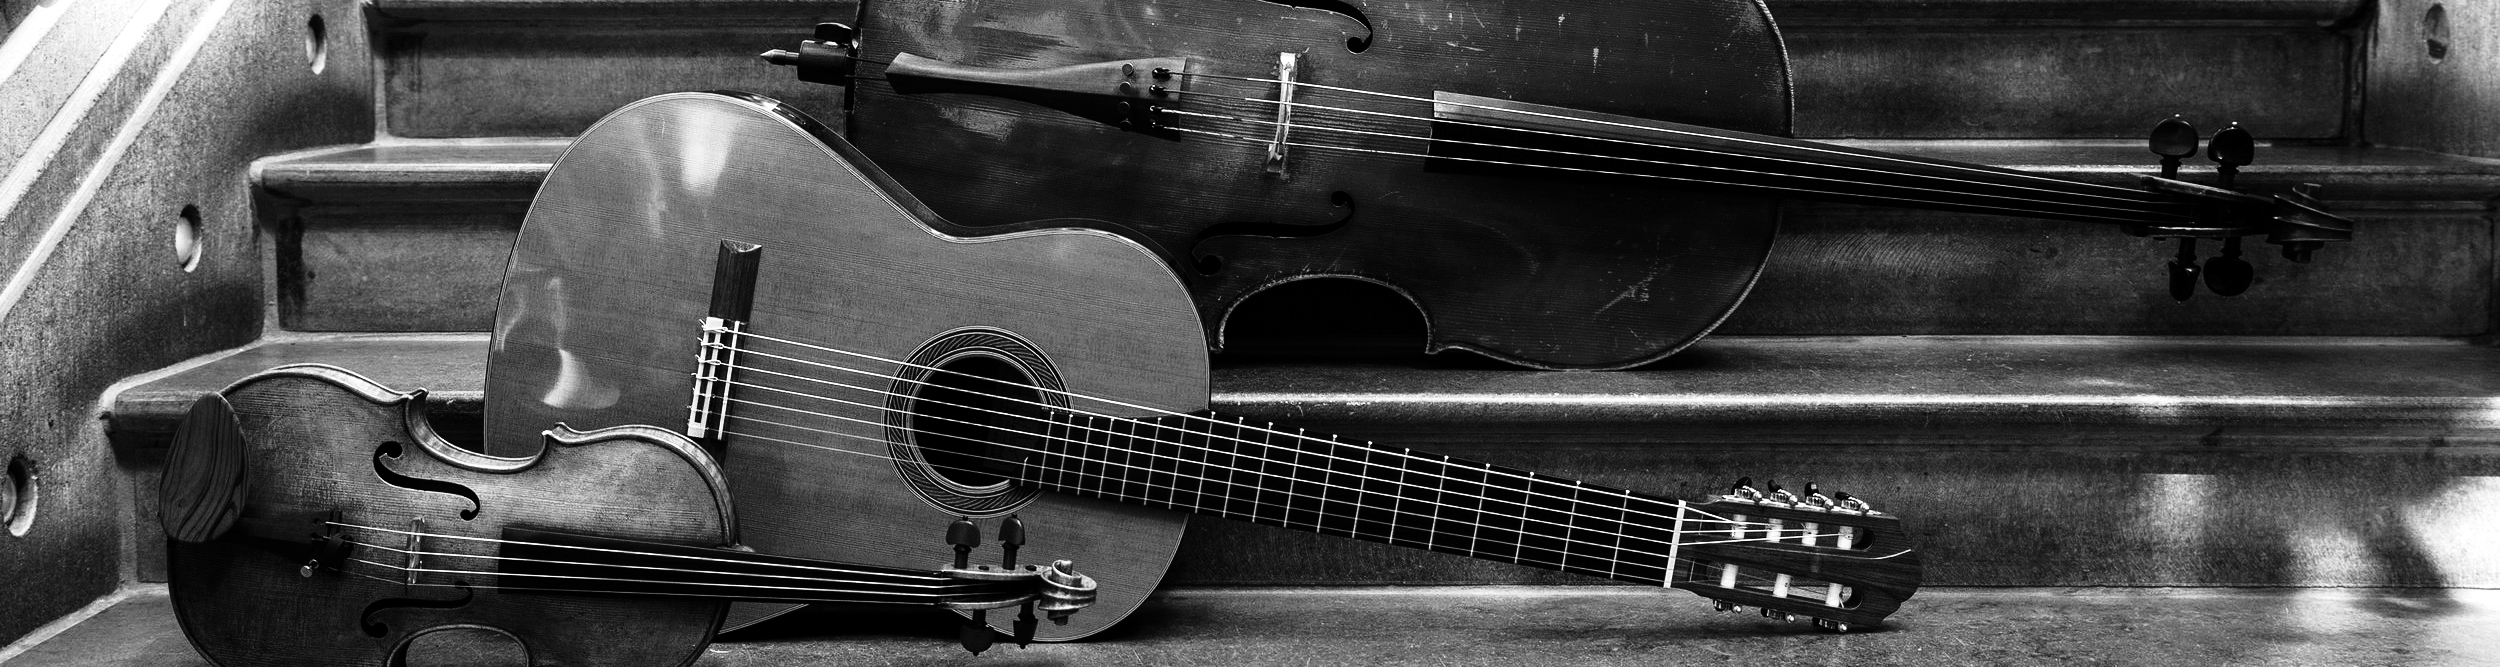 trio iberia johanne morin julie trudeau espagne spain groupe group violon violin violoniste violonist violoncelle cello violoncelliste cellist